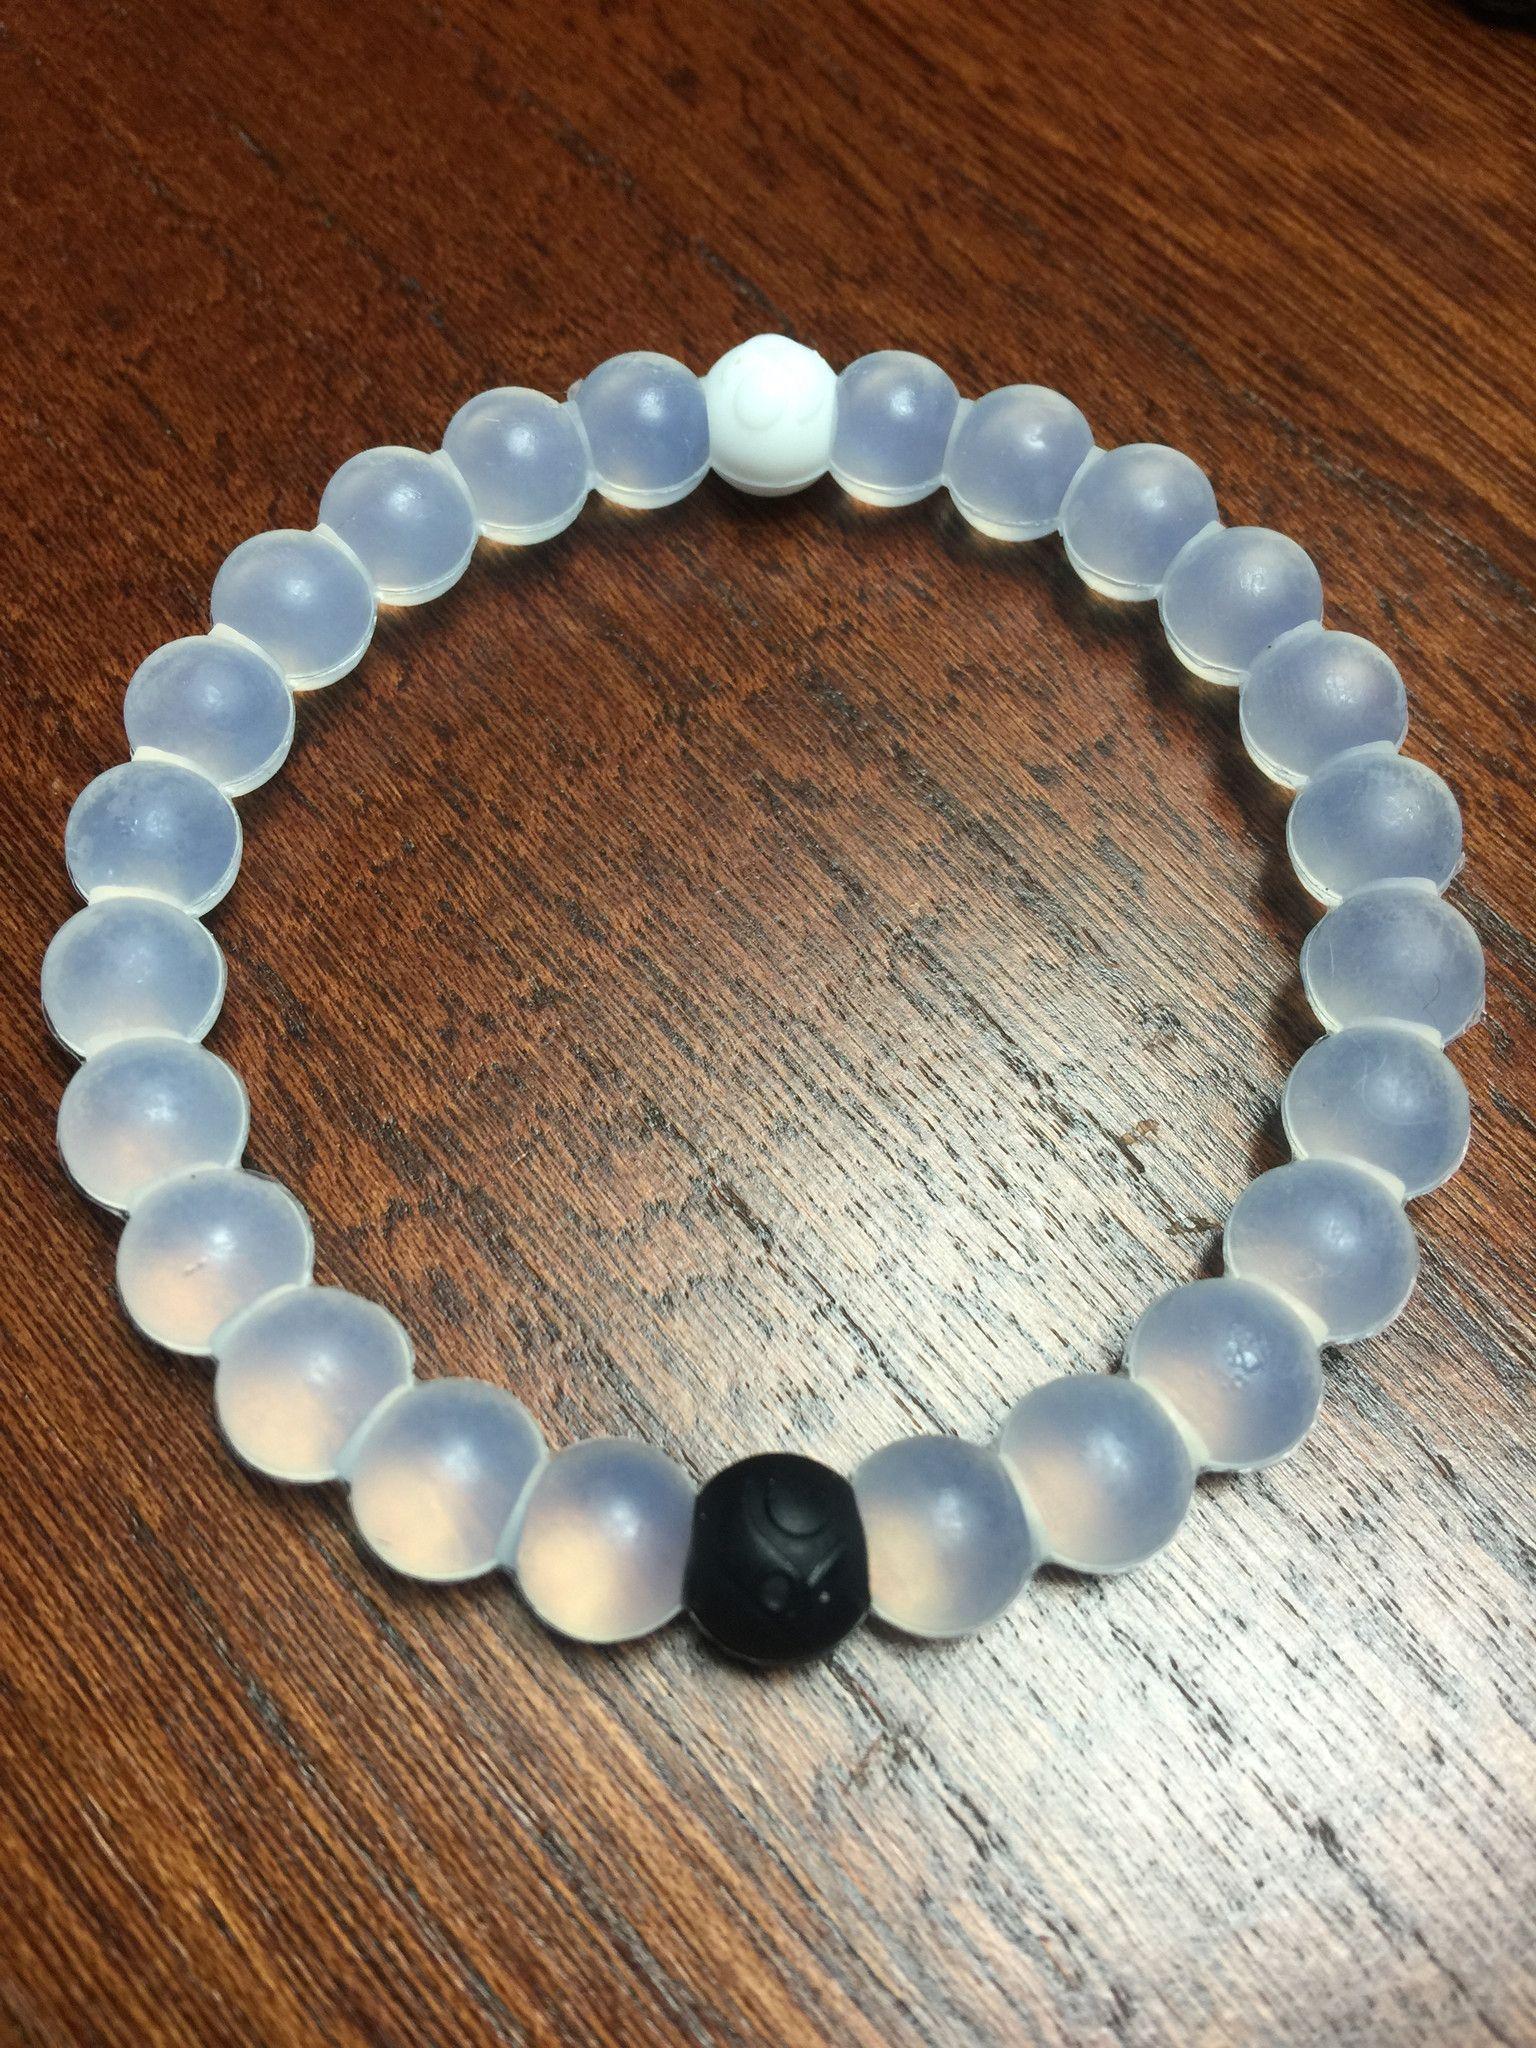 Lokai Clear Bracelet Bracelets Jewelry Accessories